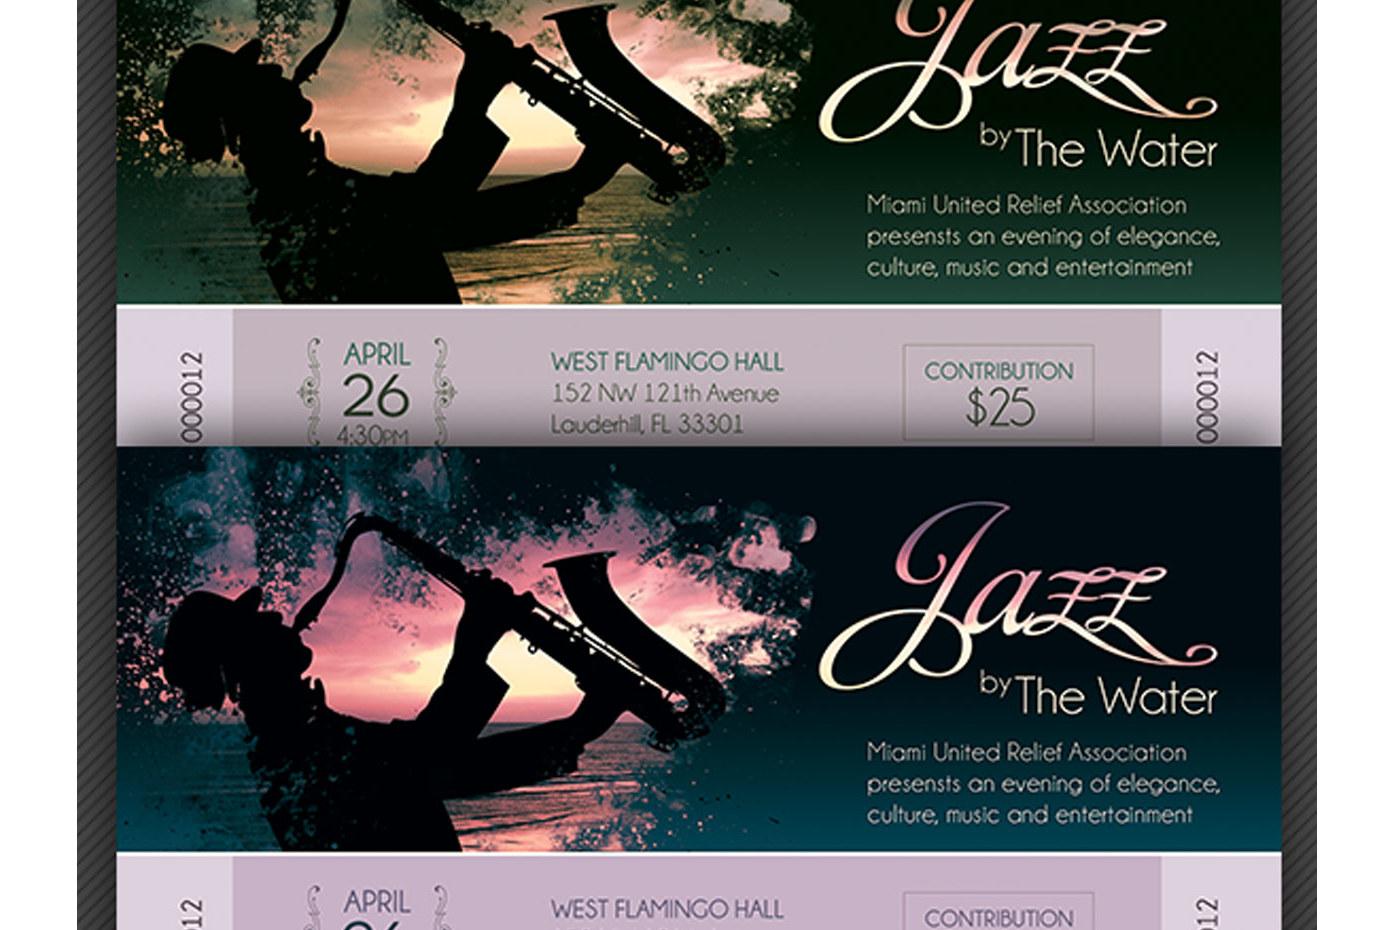 Jazz Concert Event Ticket Template example image 5